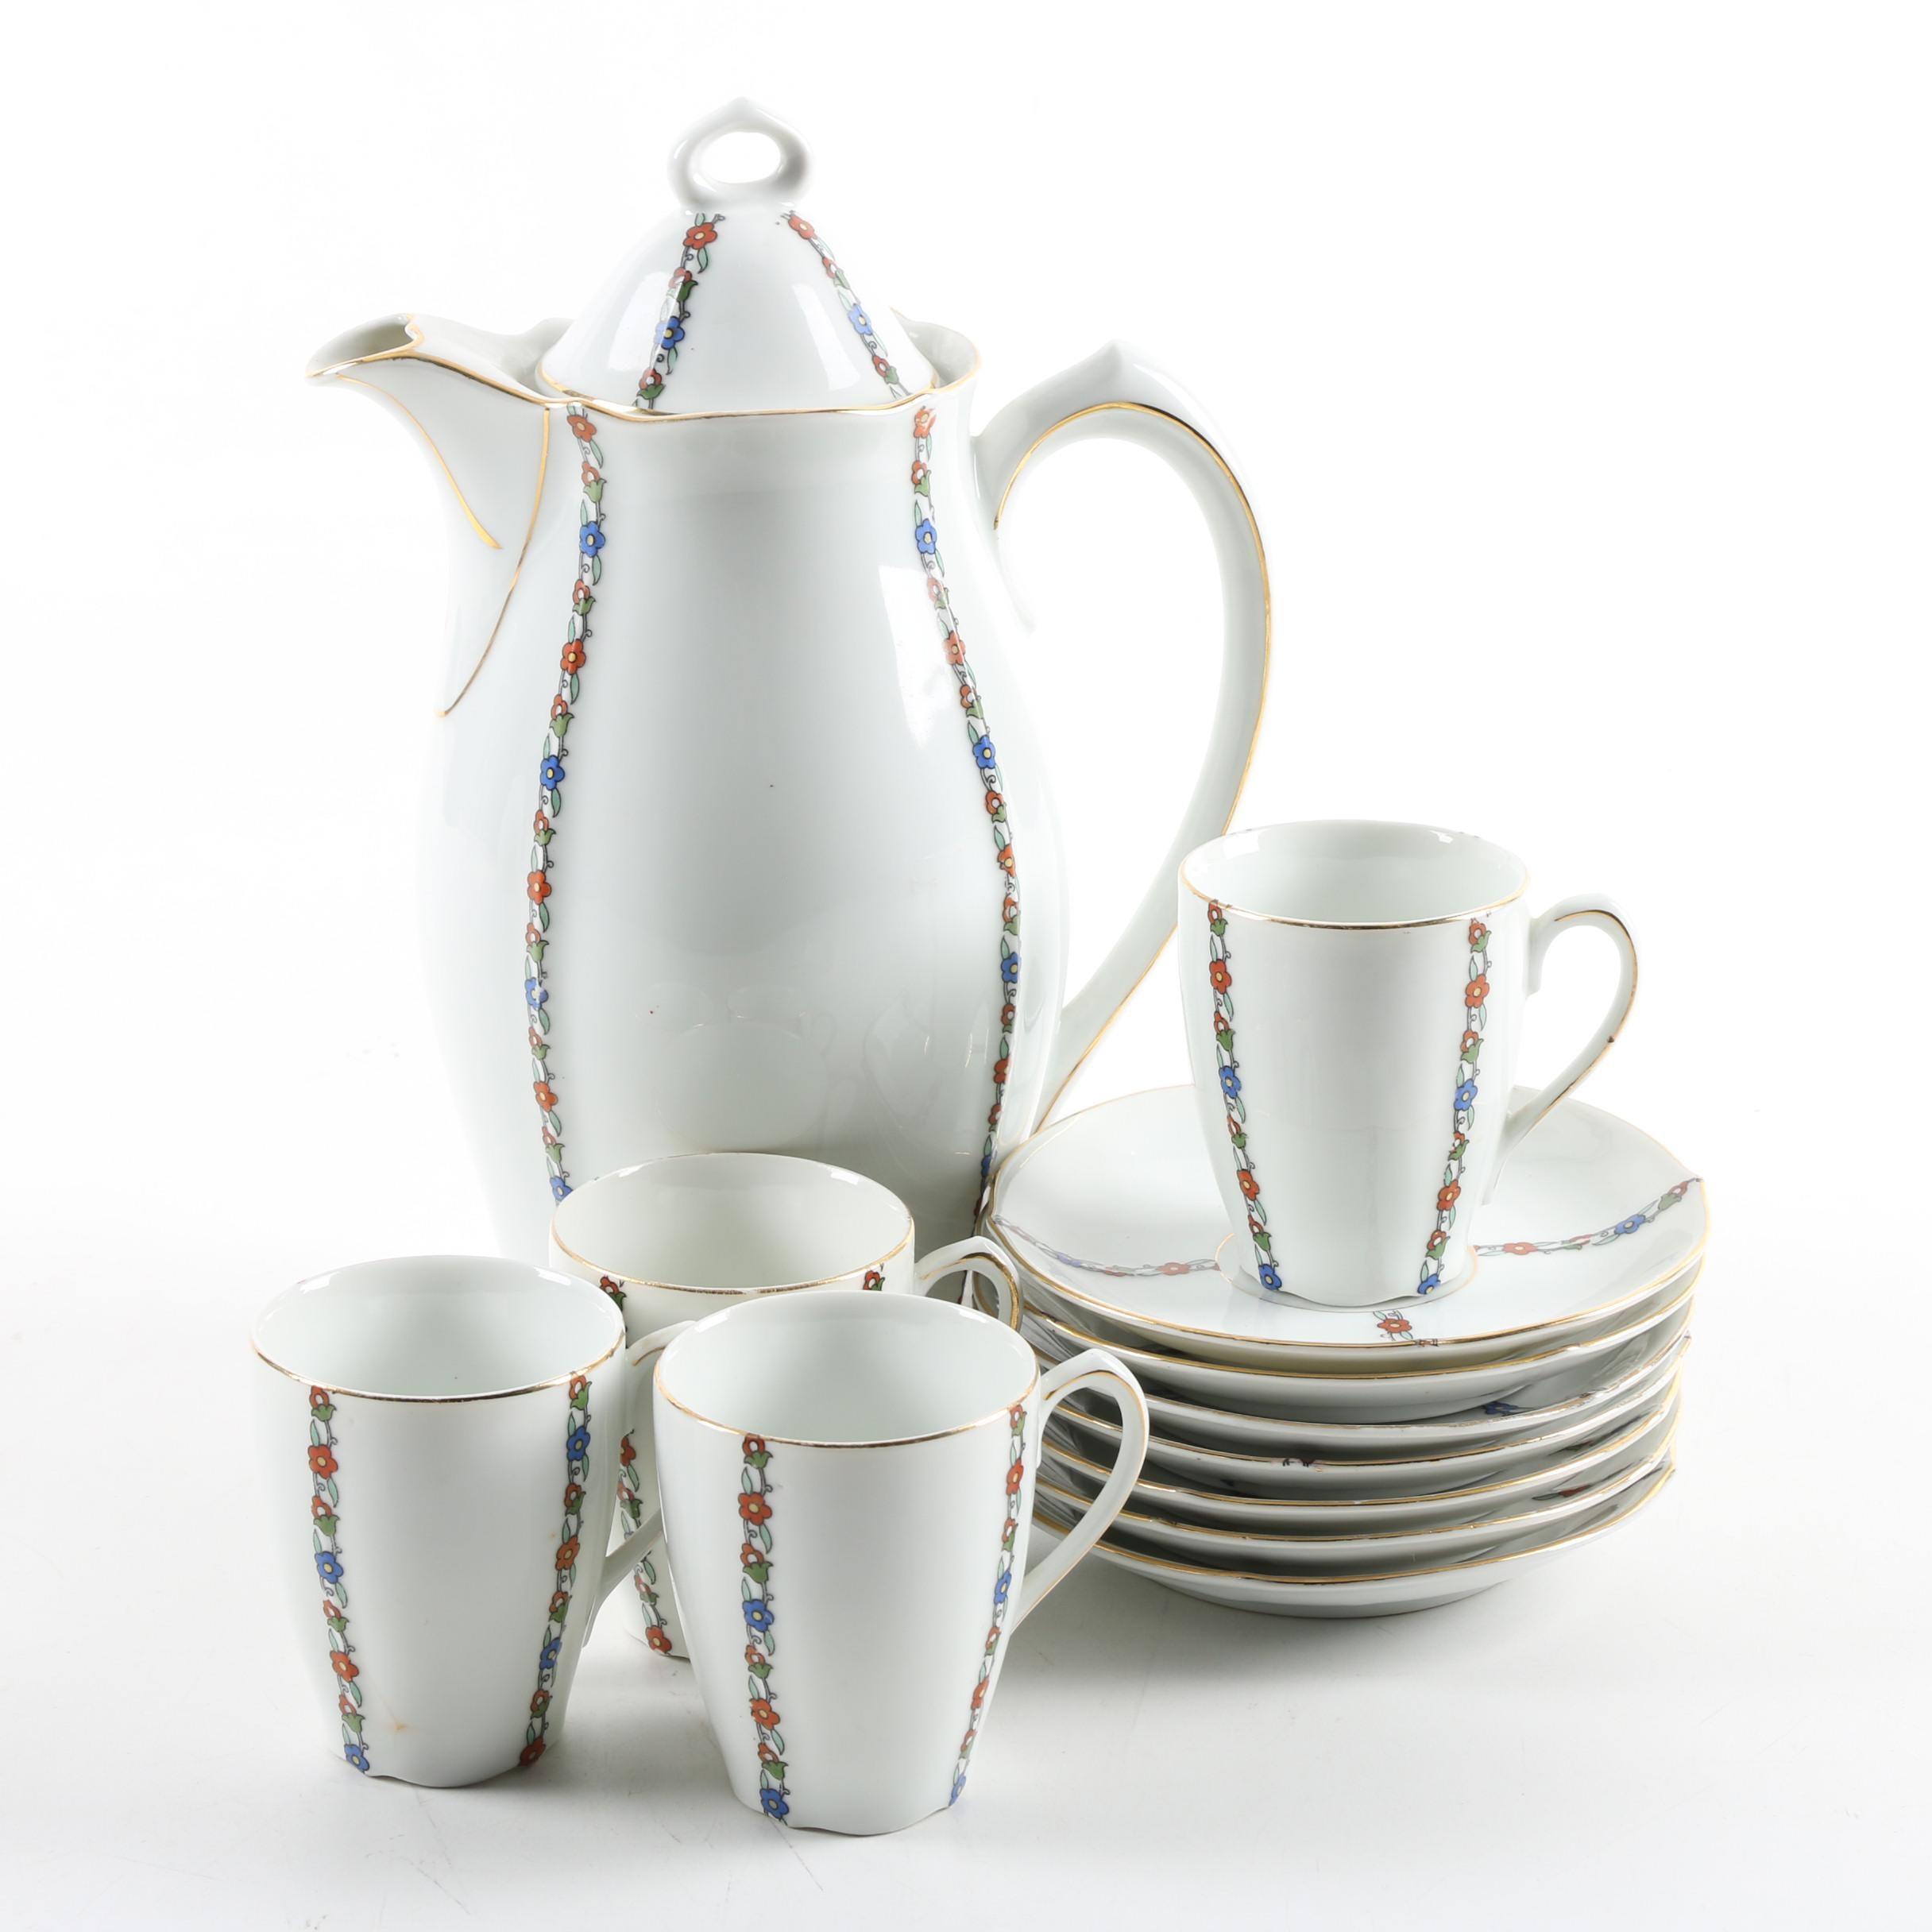 German Porcelain Chocolate Service